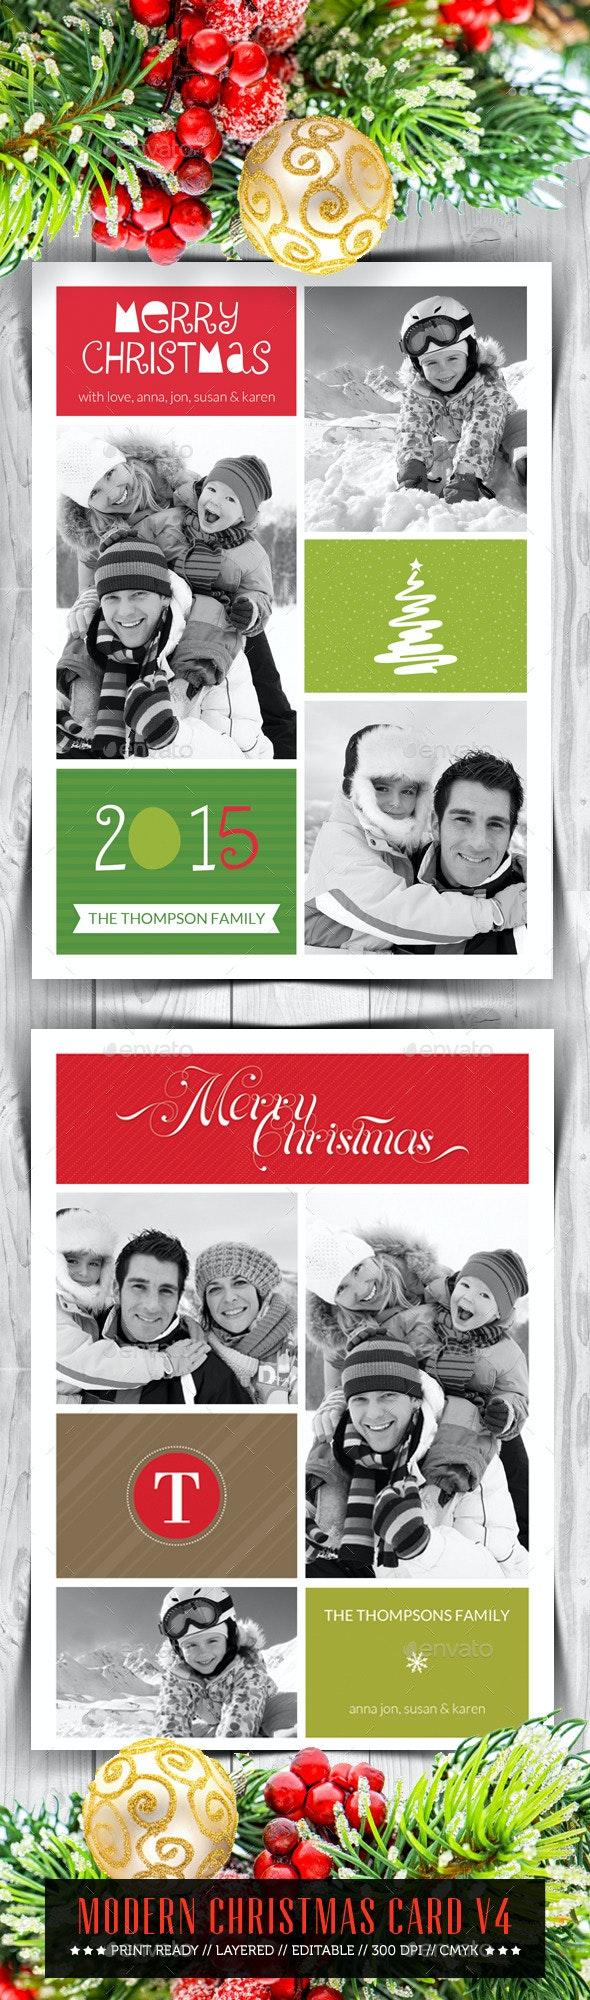 Modern Christmas Card V4 - Holiday Greeting Cards